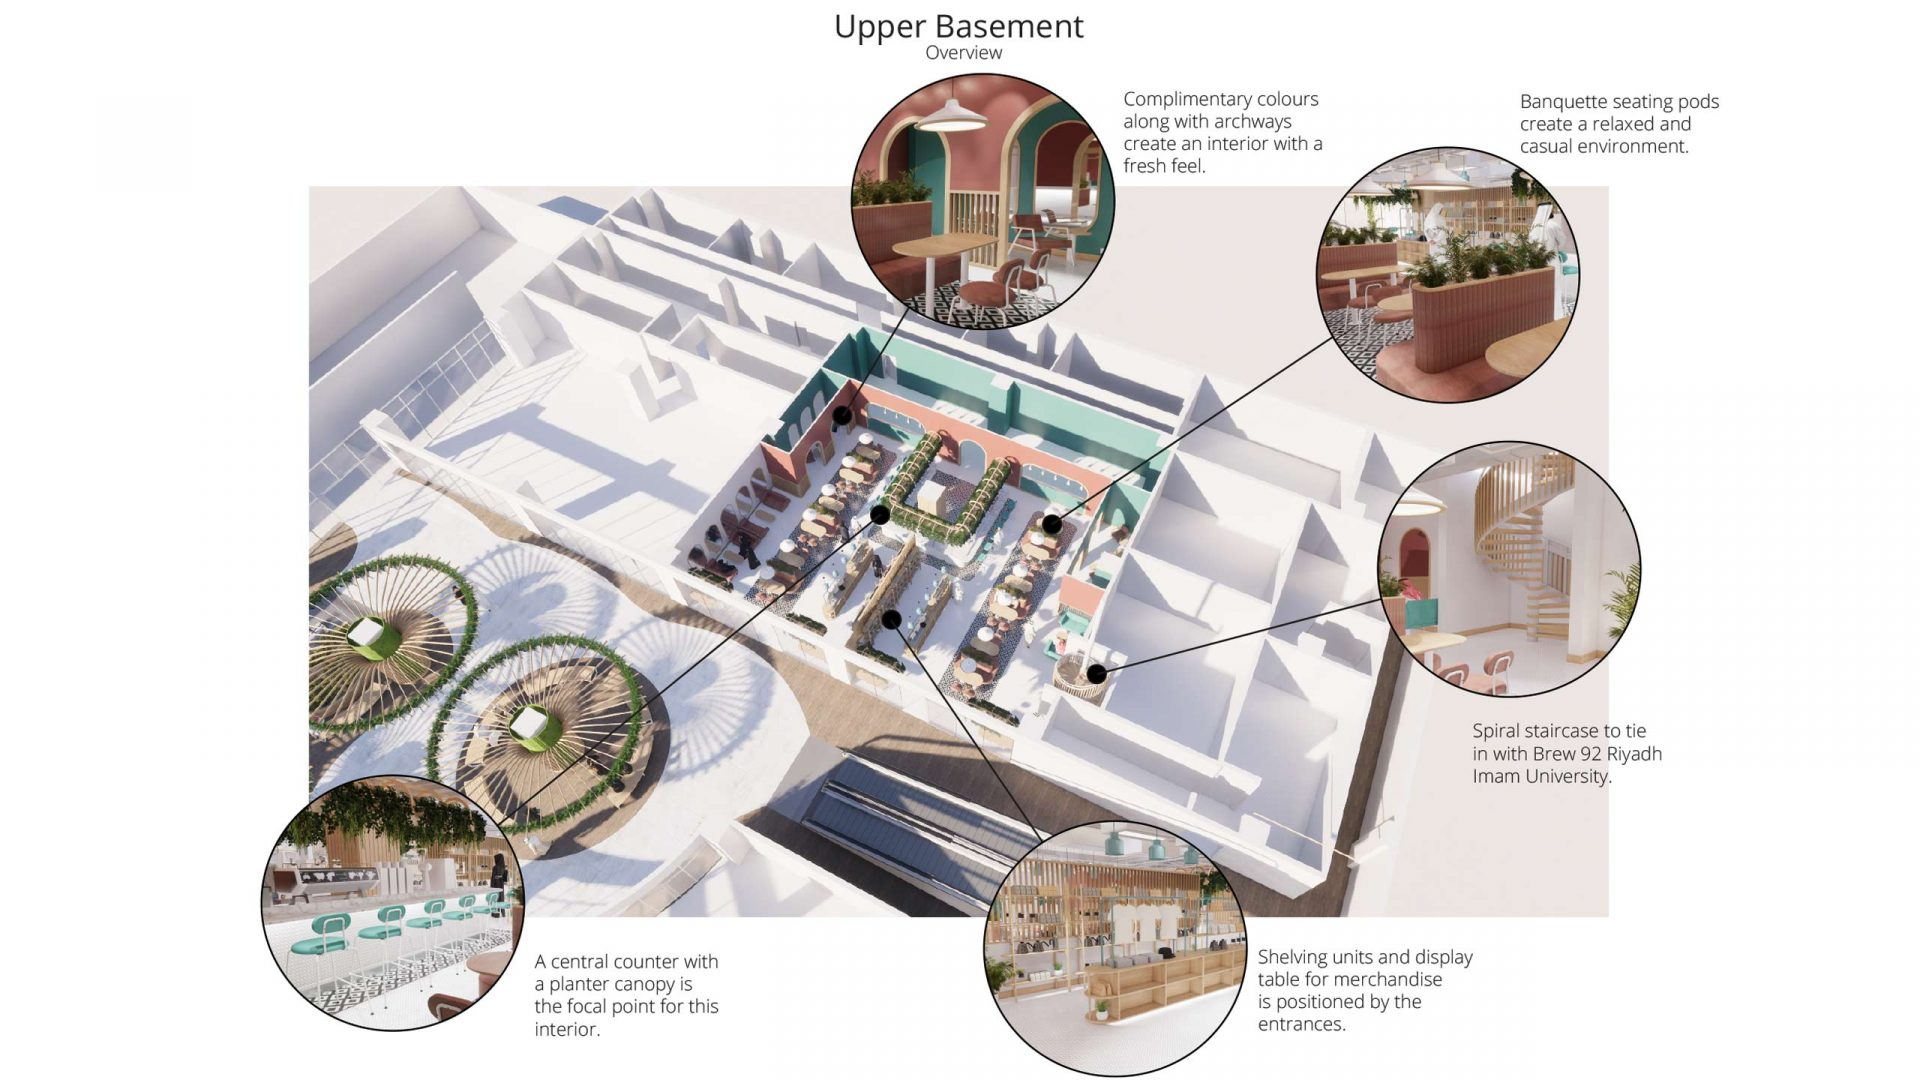 Brew92 Coffee Shop, Mecca by Liqui. Top down render of the Upper Basement interior design